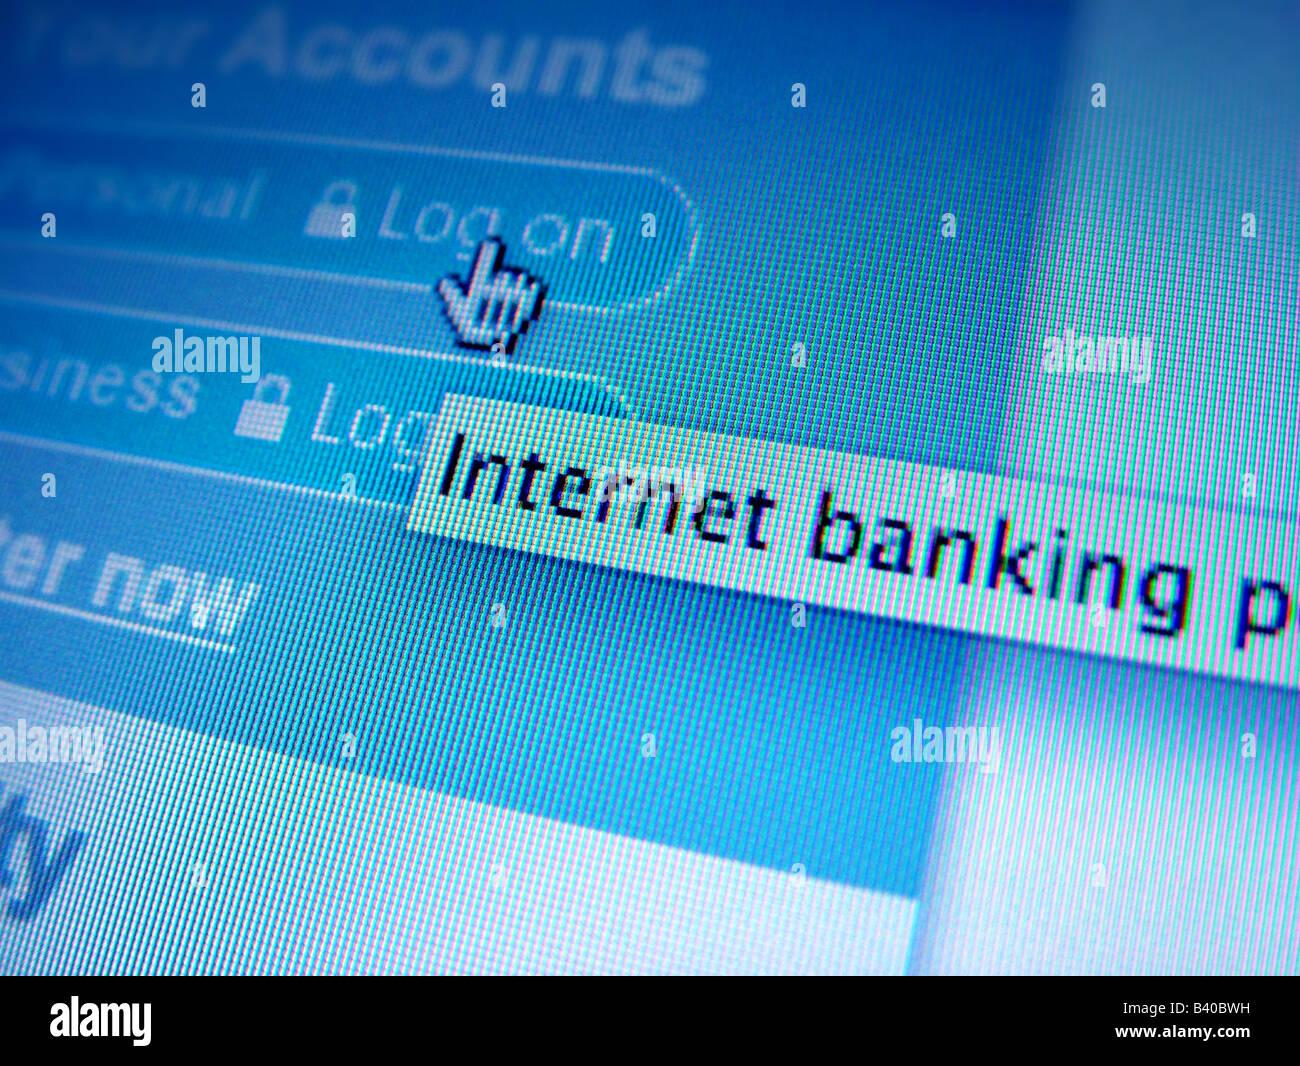 internet banking - Stock Image